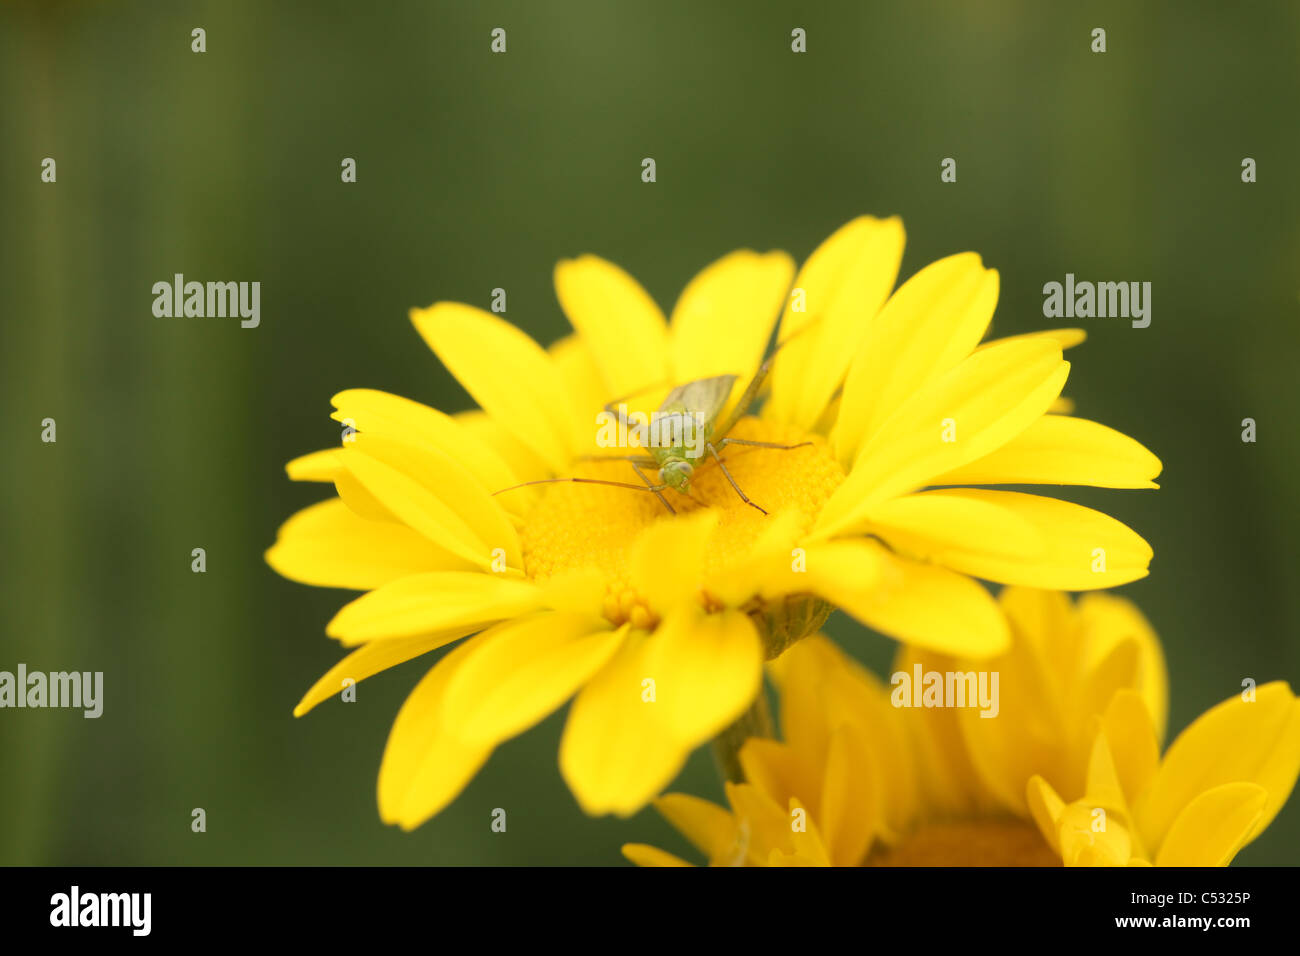 Common Yellow Garden Flowers common green capsid bug (lygocoris pabulinus) on a yellow daisy